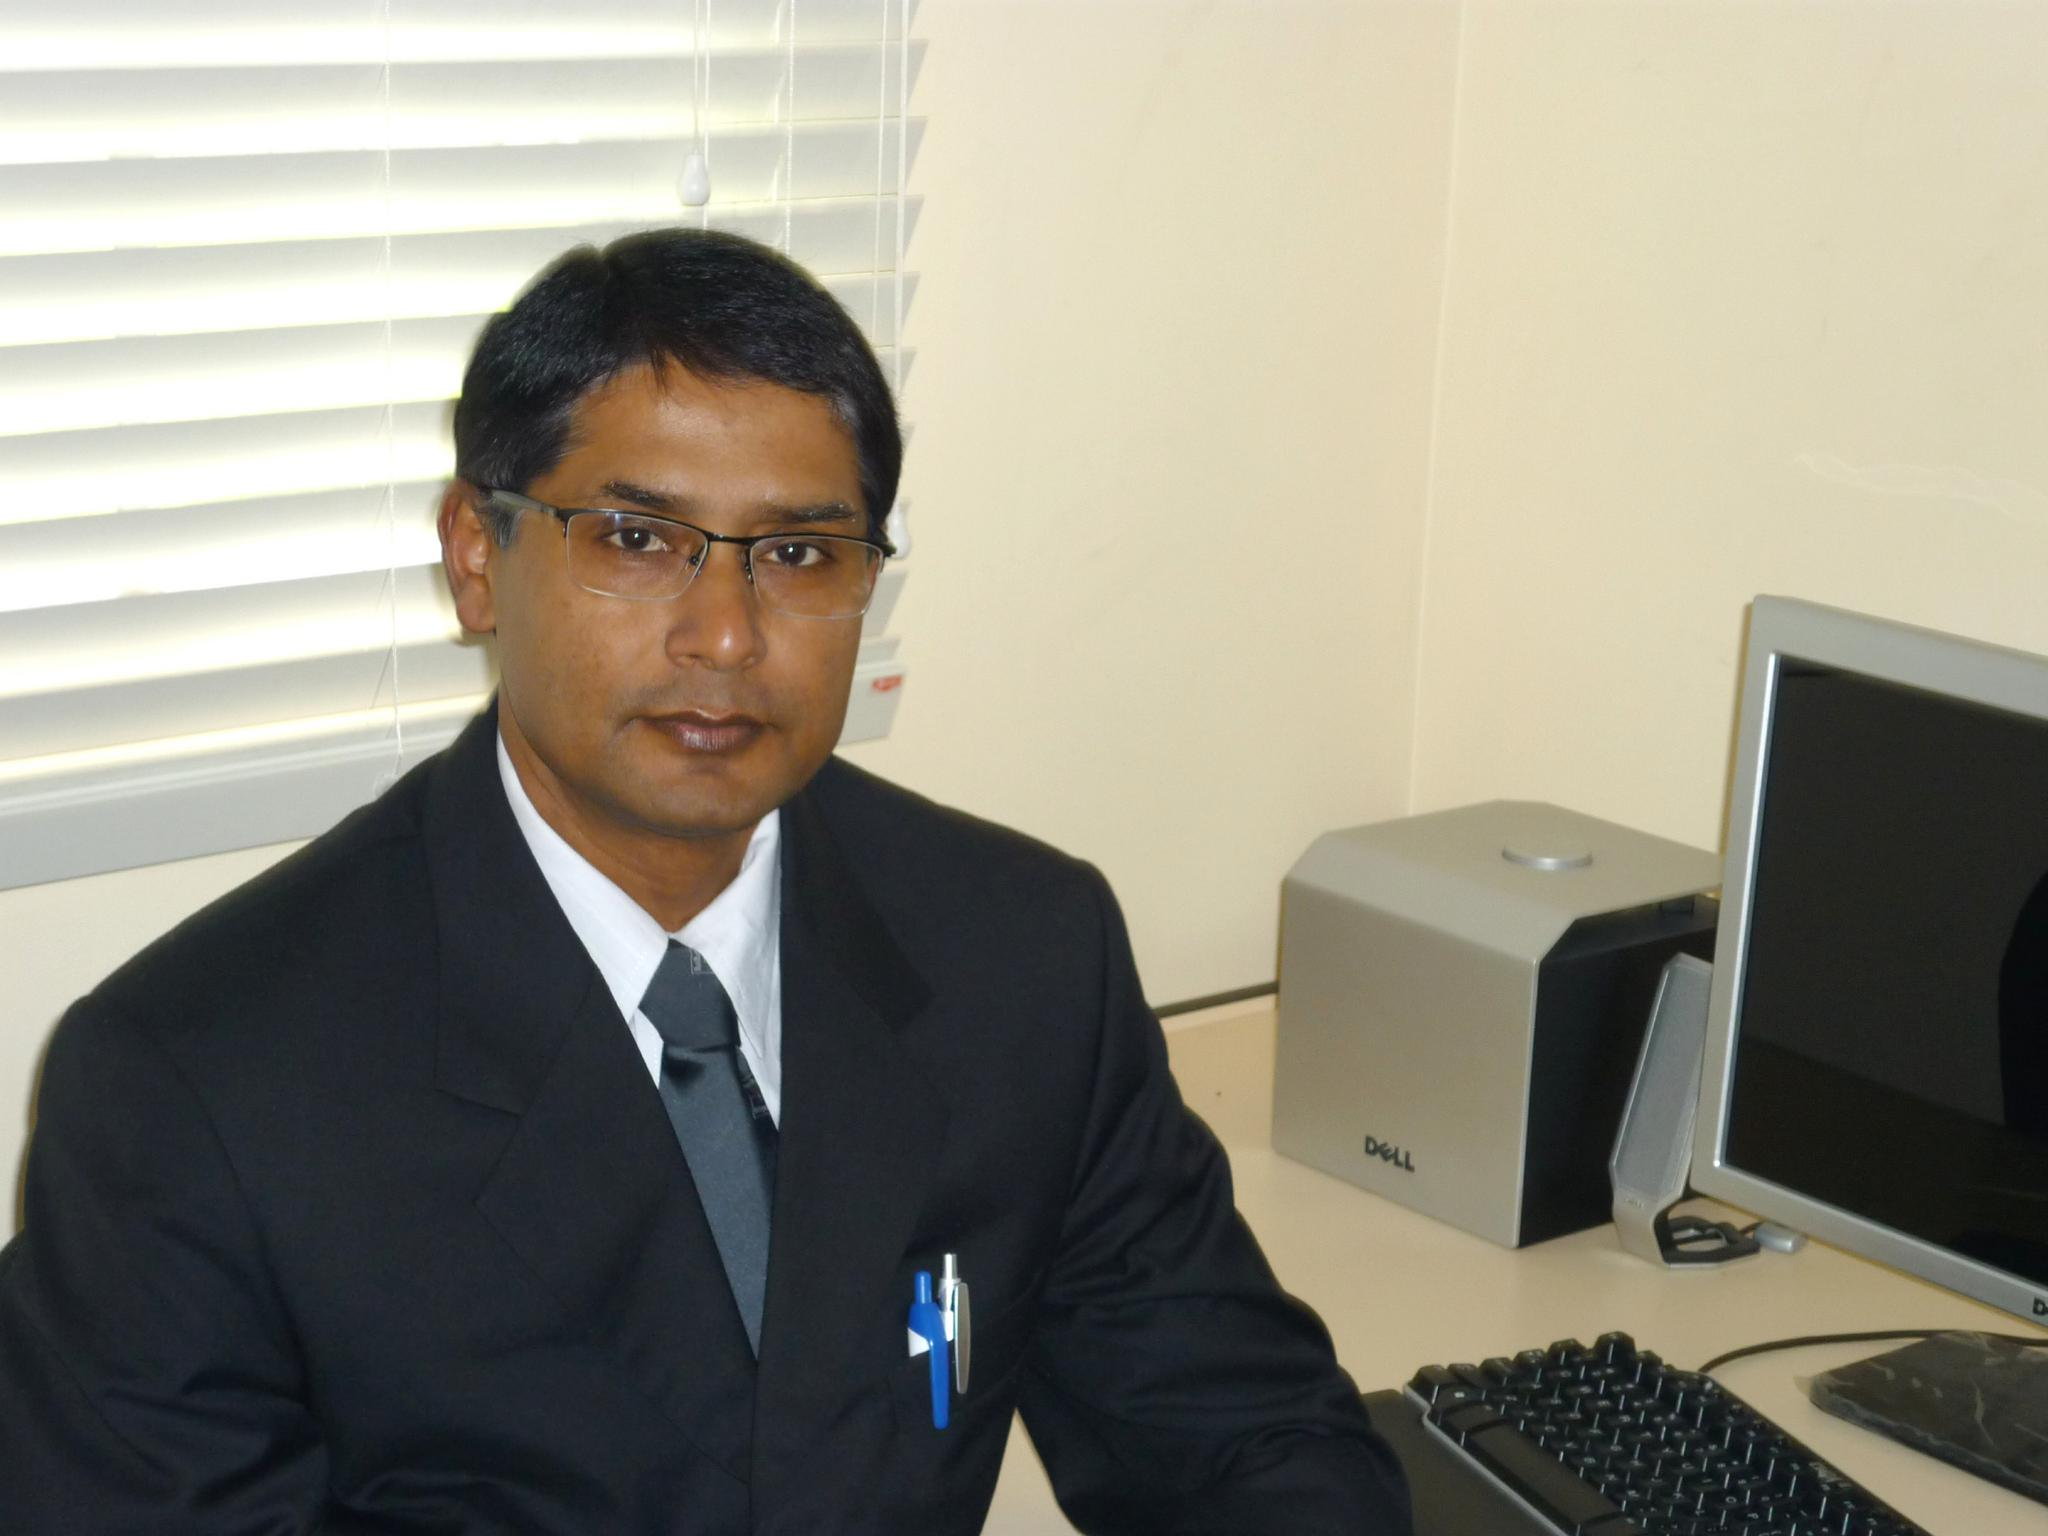 Dilip Ghosh